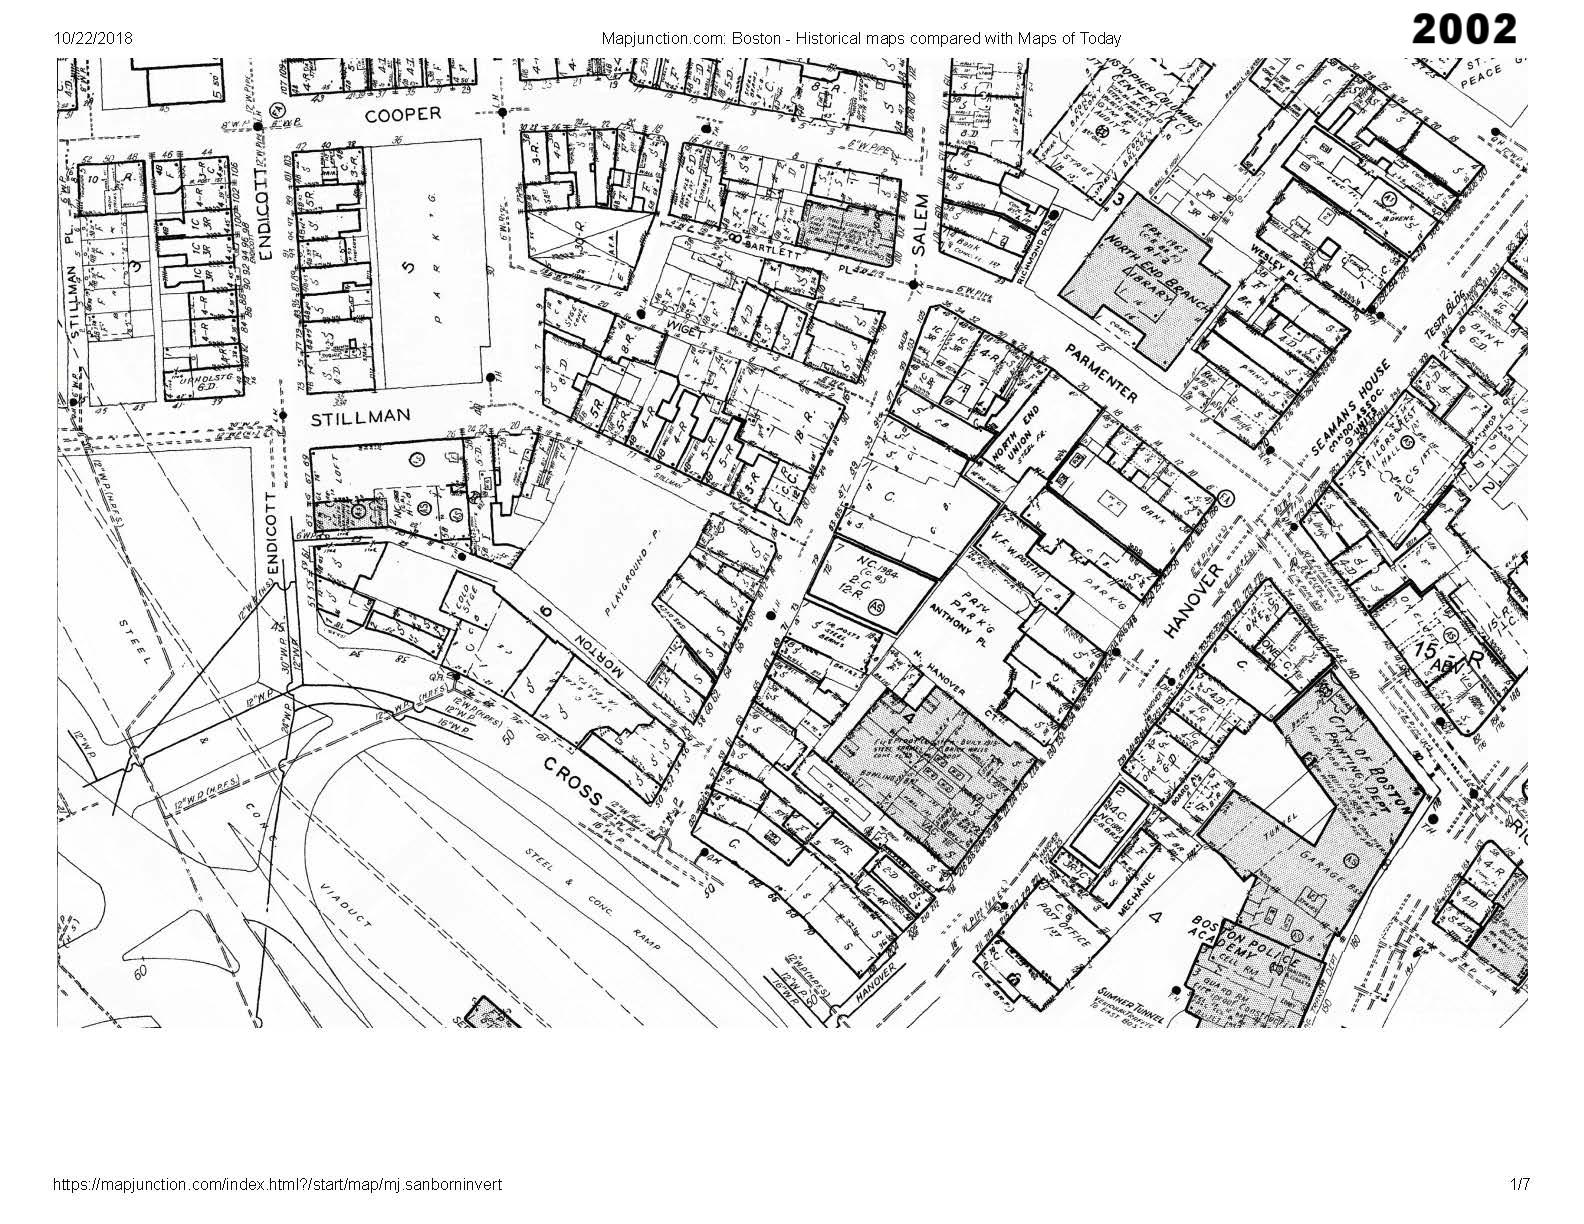 2002 map of cutillo park and morton street area